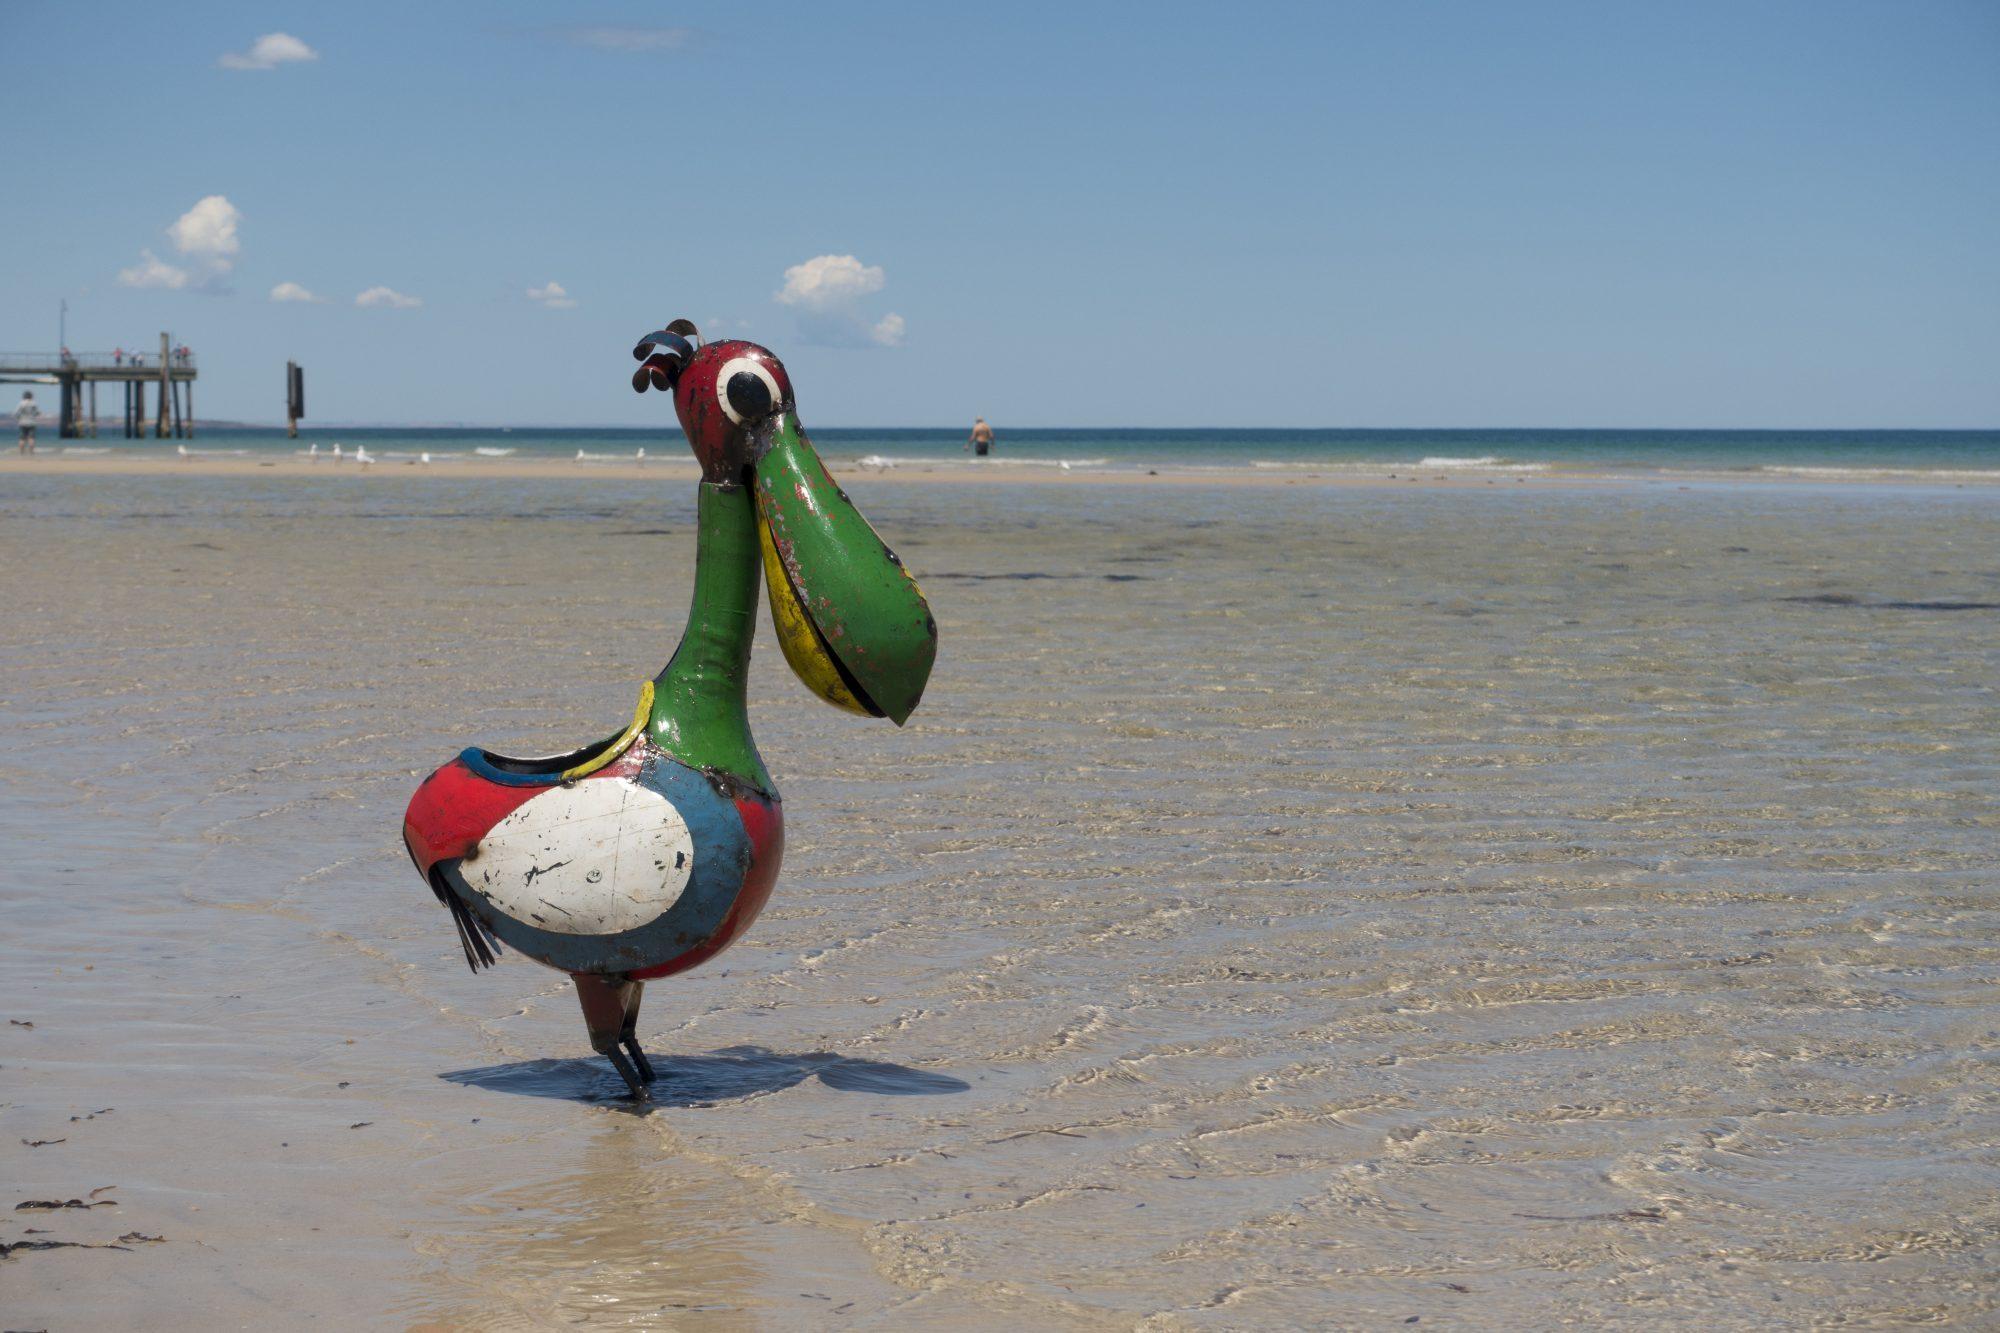 Adelaide beach holiday accommodation Percival paddling